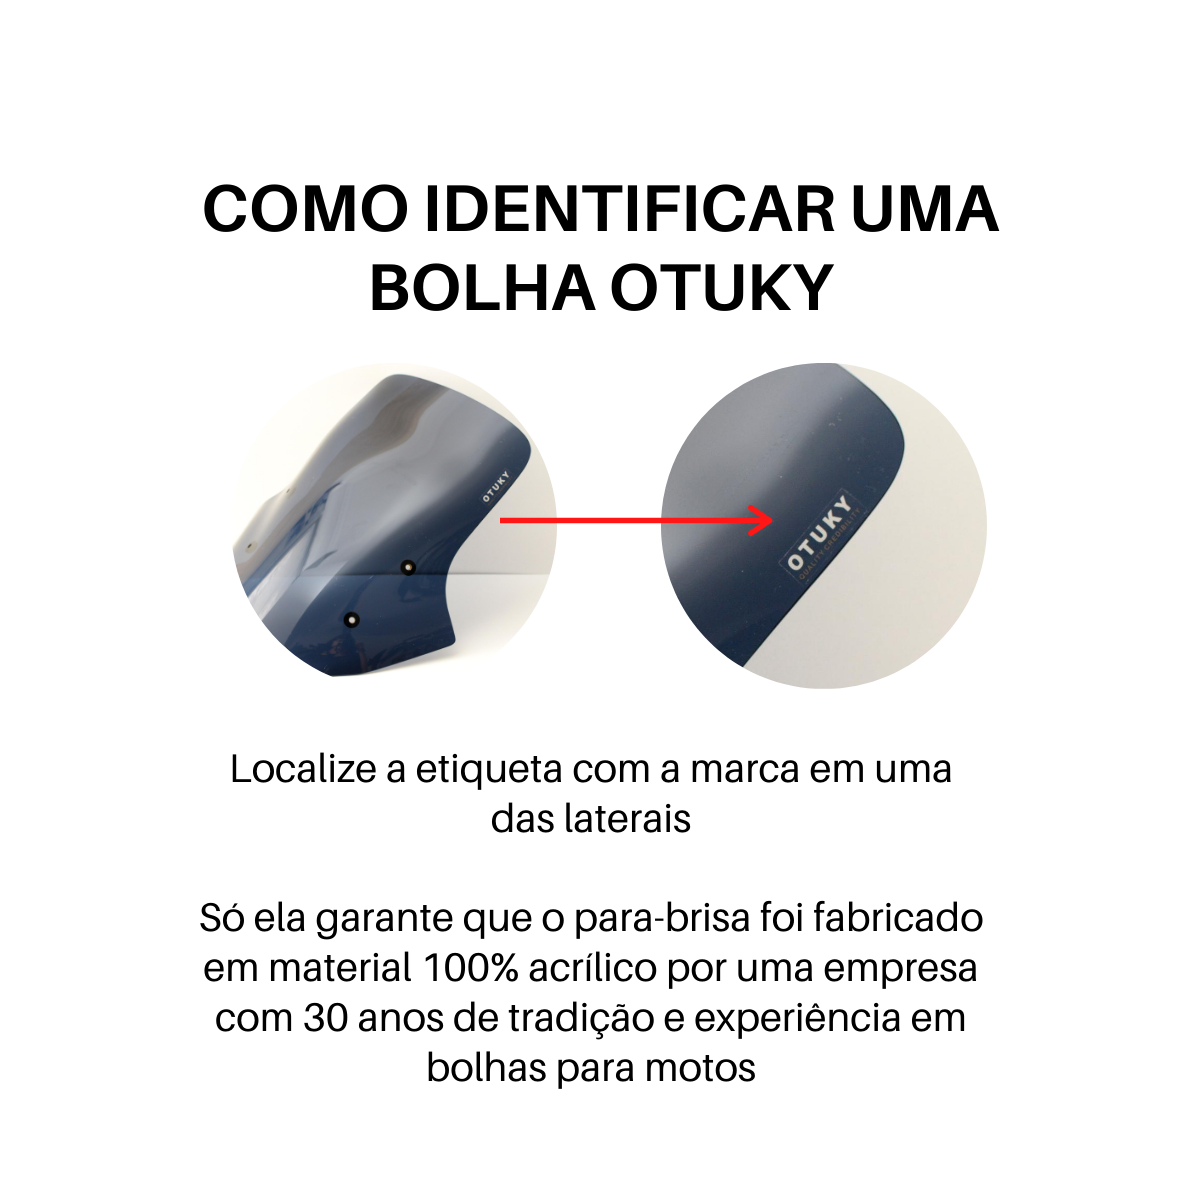 Bolha para Moto GSX 1300 R Hayabusa 2008 2009 2010 2011 2012 2013 2014 2015 2016 2017 2018 Otuky Fumê Cinza-claro